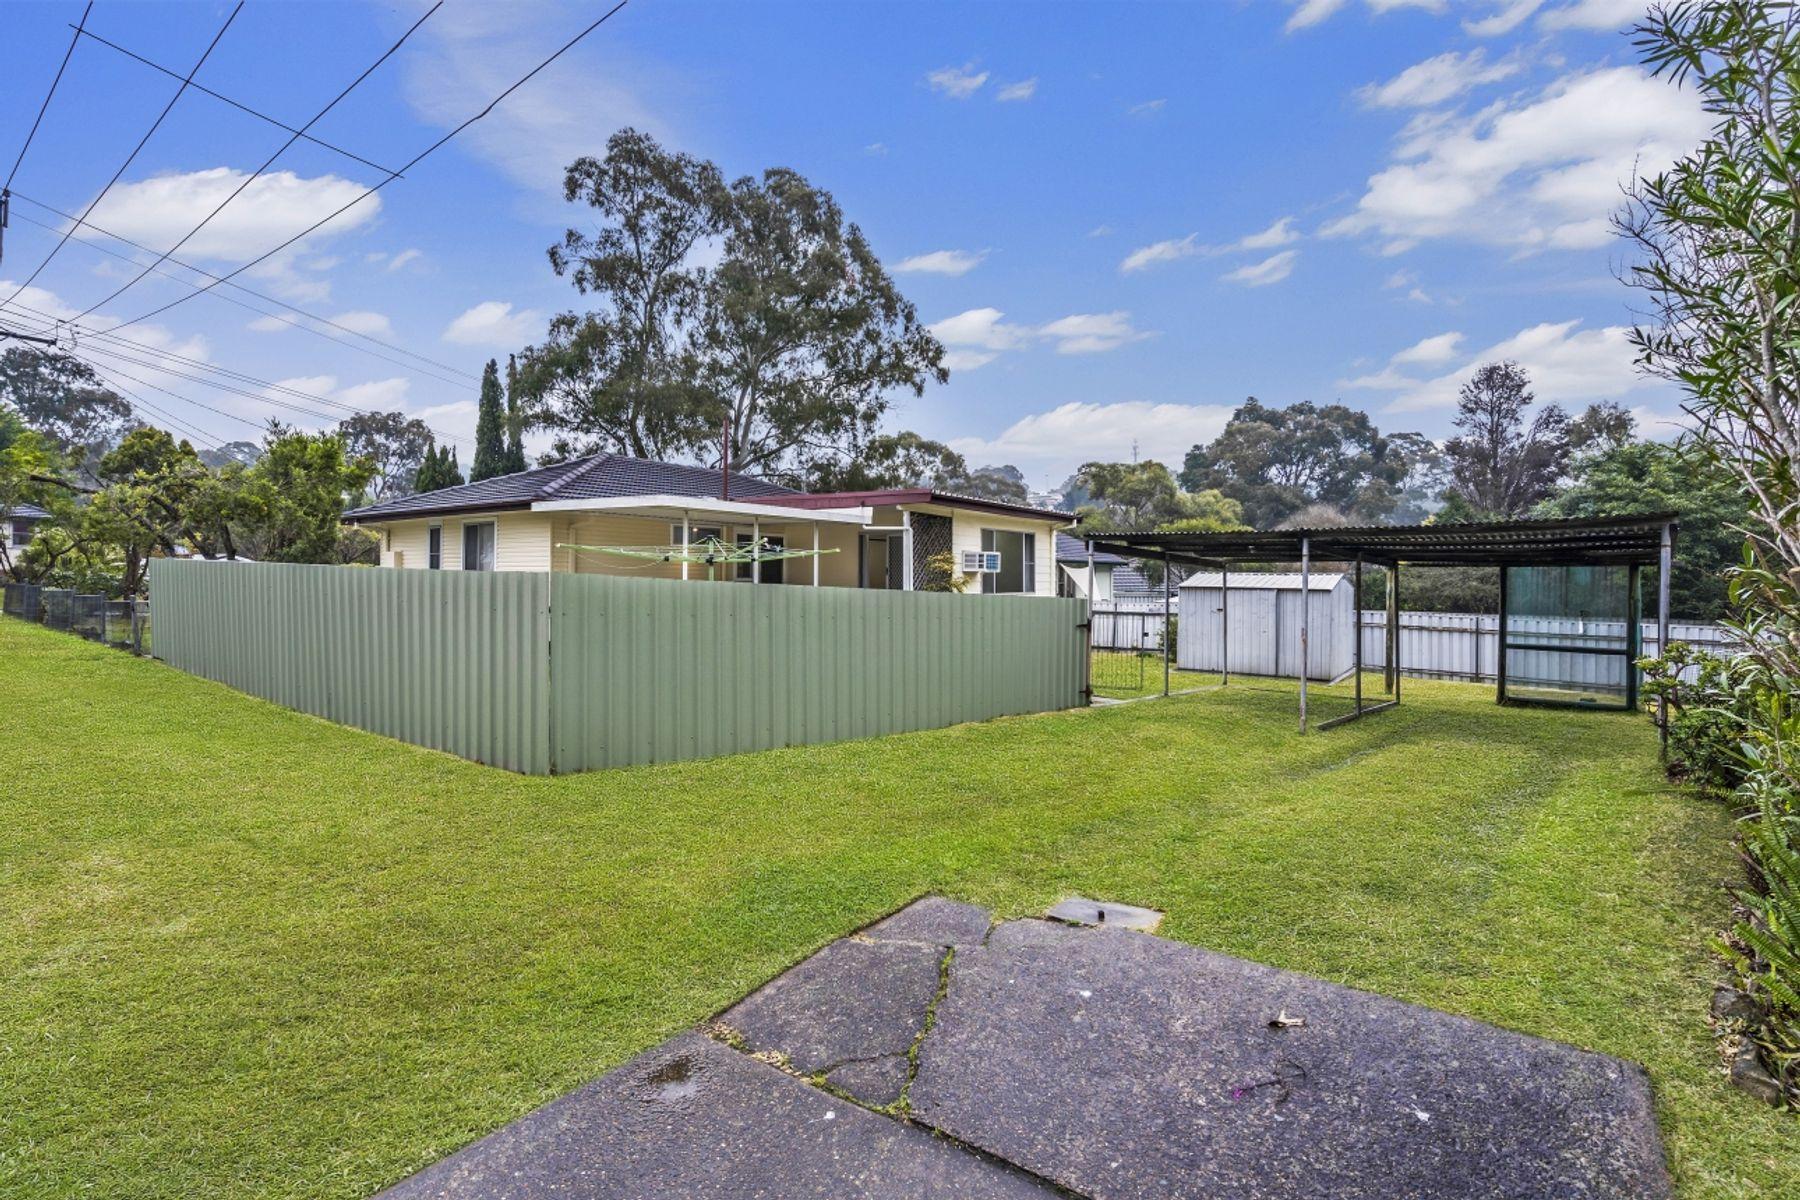 34 Allowah Street, Waratah West, NSW 2298